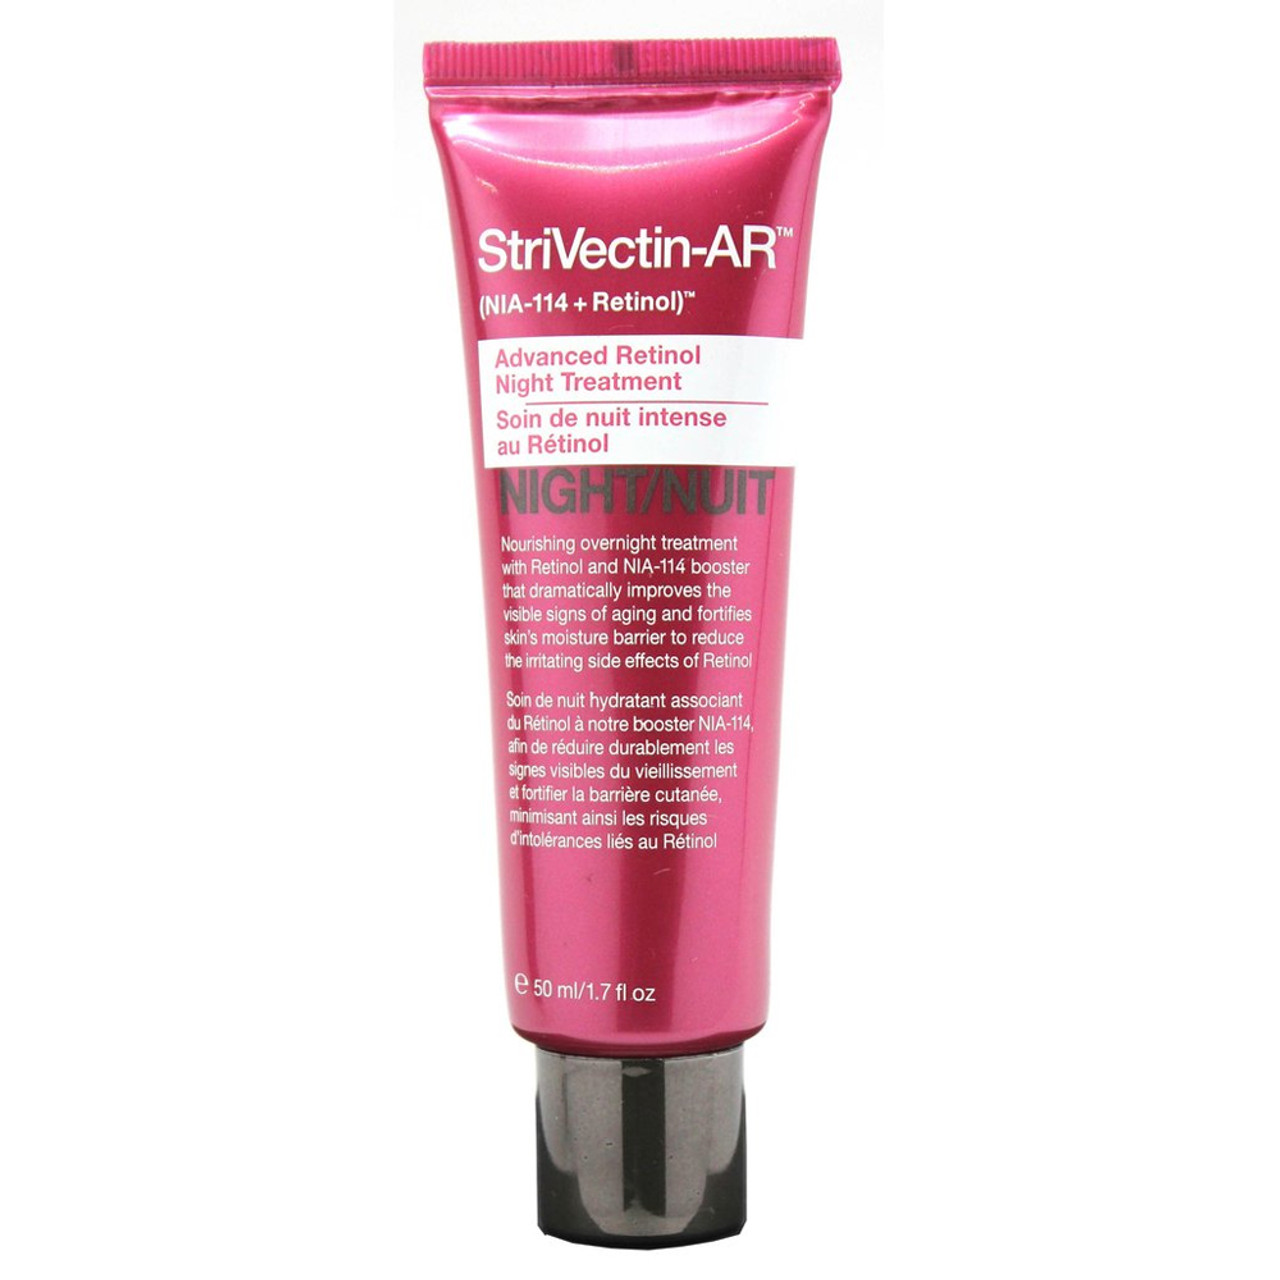 StriVectin-AR Advanced Retinol Night Treatment